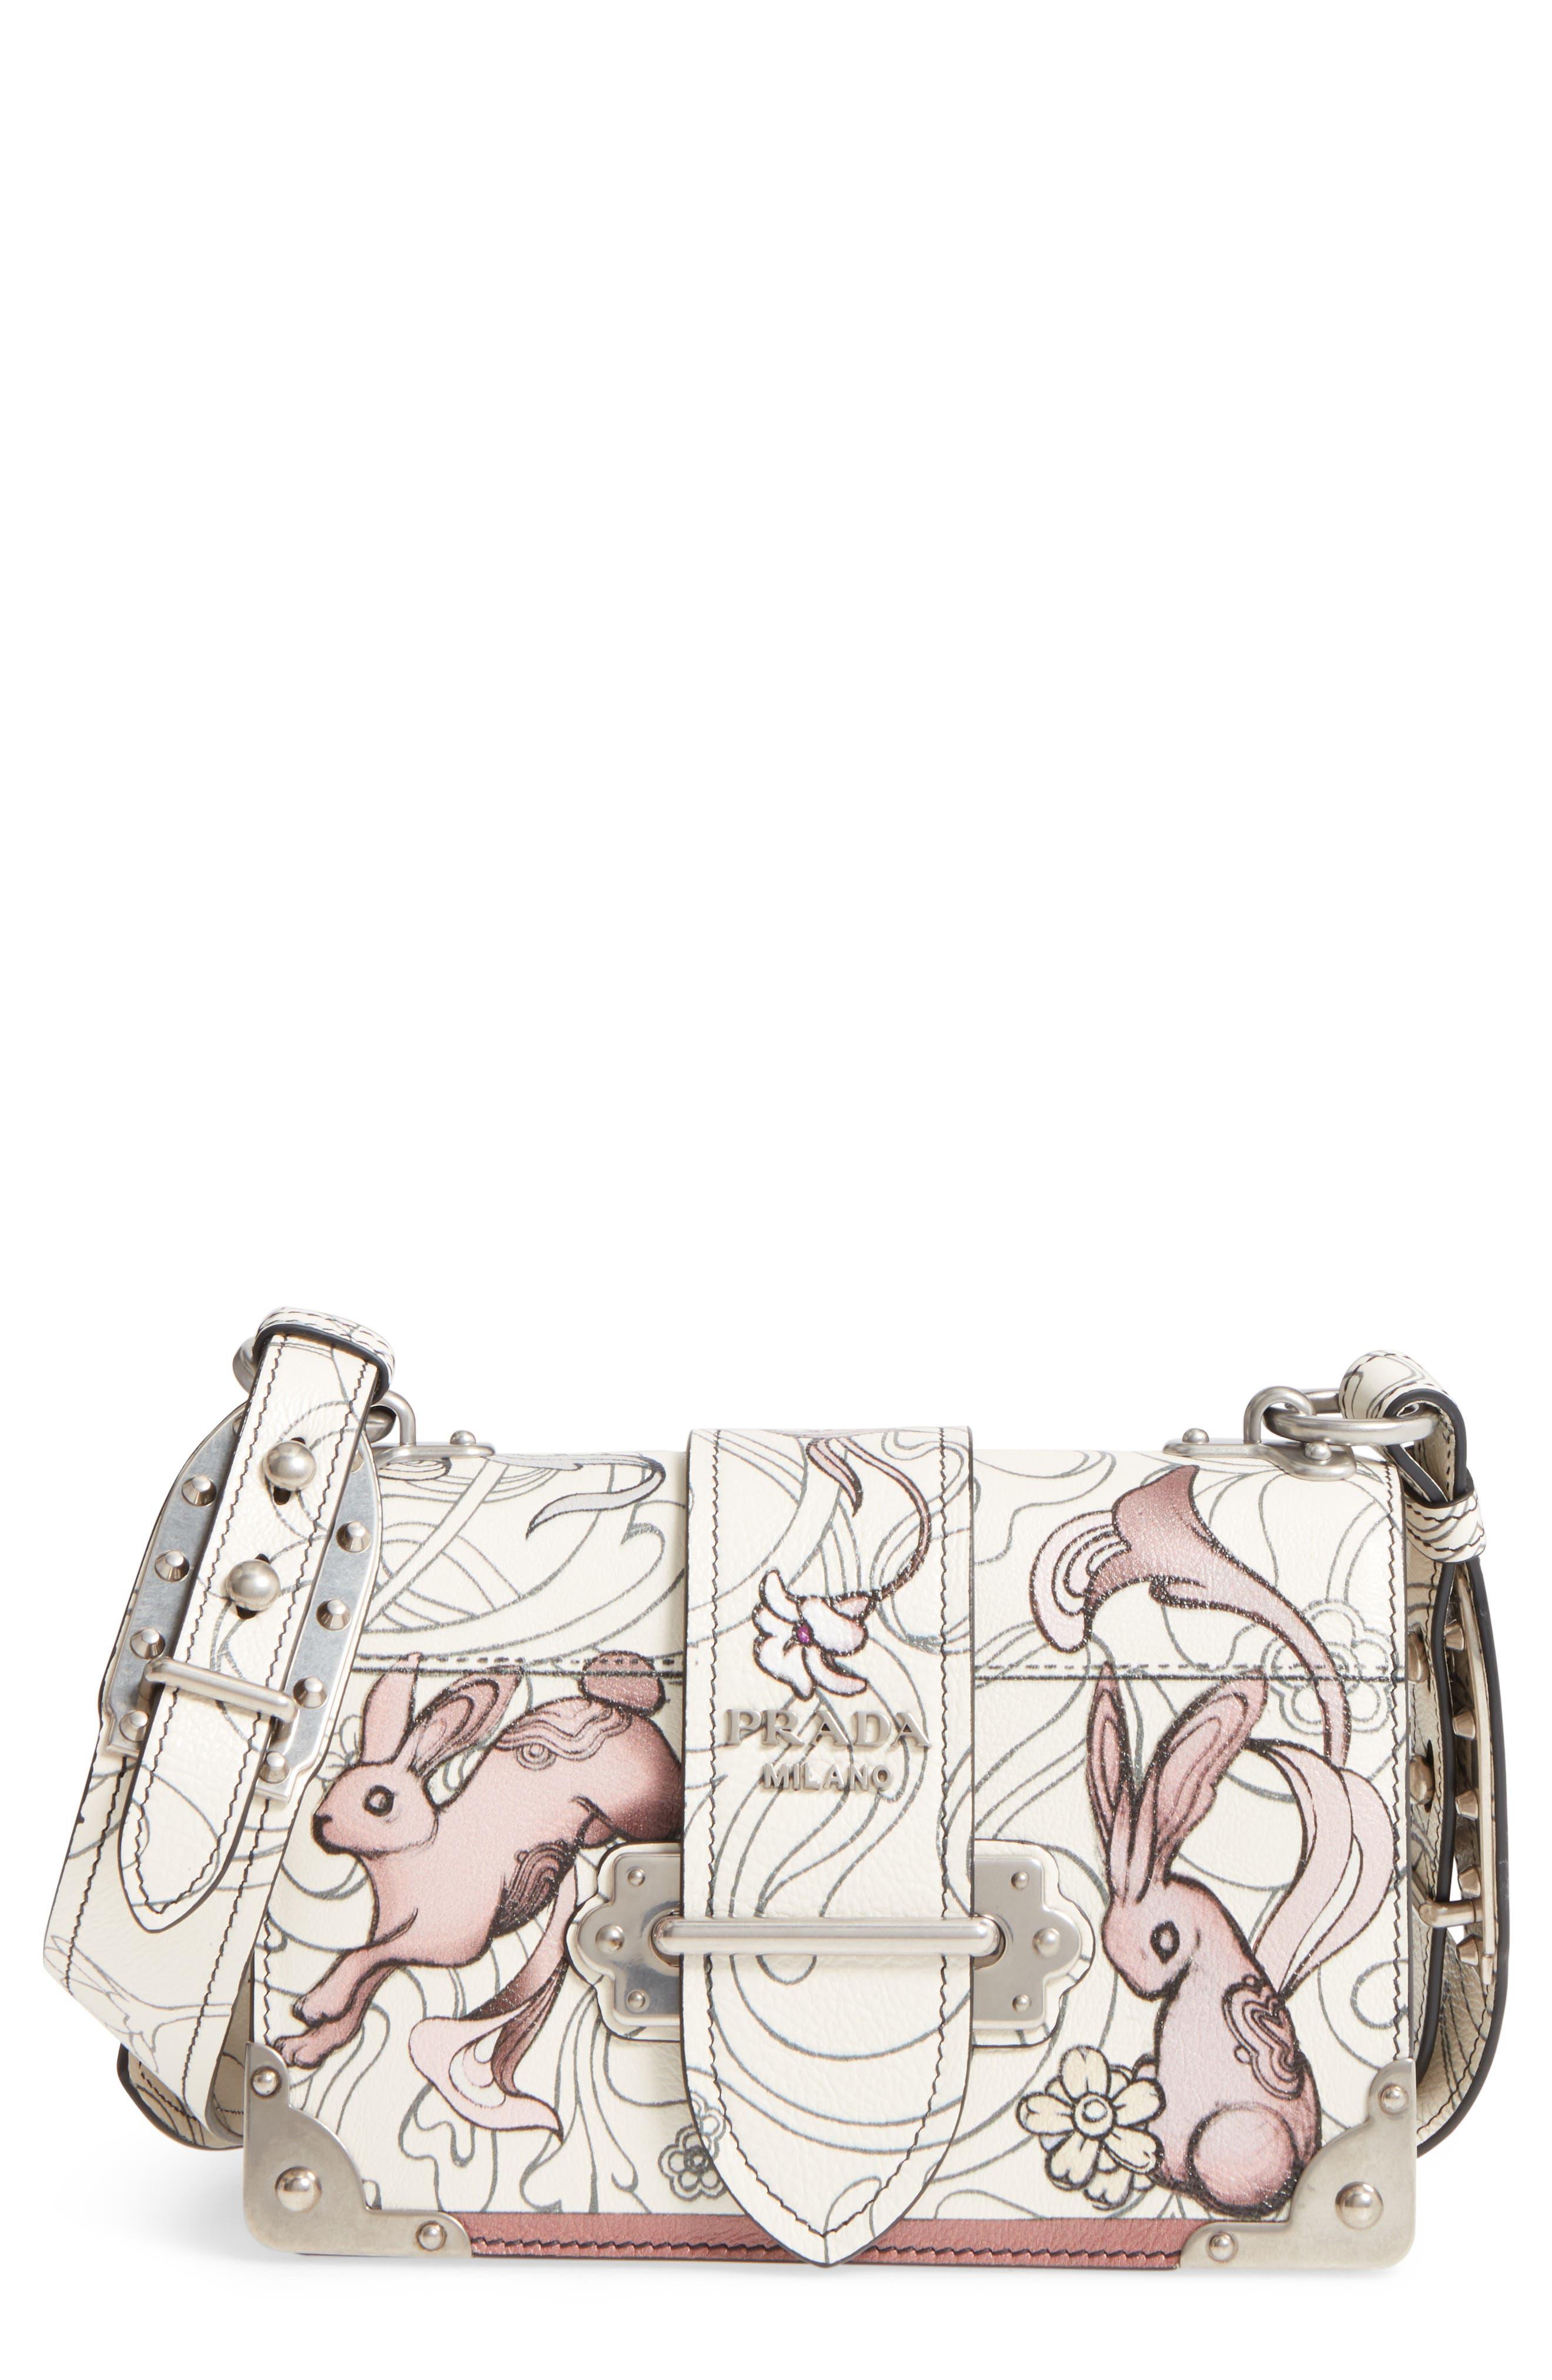 Cahier Calfskin Shoulder Bag,                             Main thumbnail 1, color,                             100